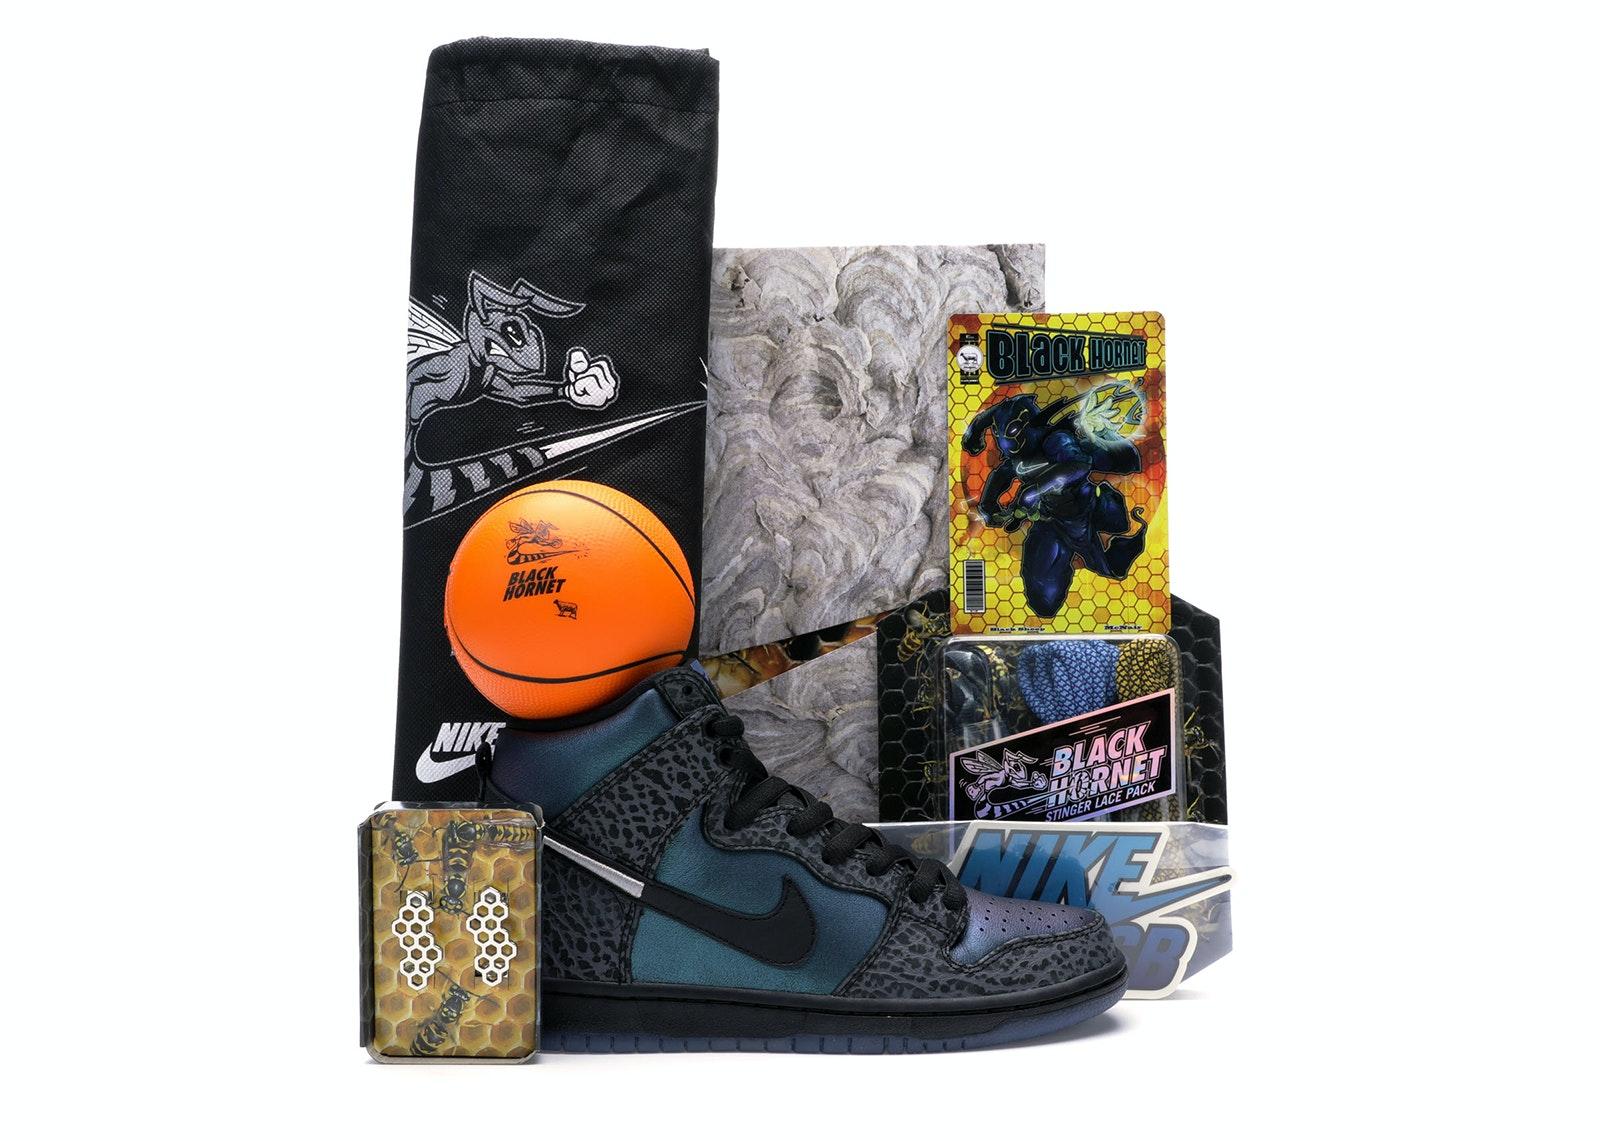 Nike SB Dunk High Black Sheep Hornet (Special Packaging)